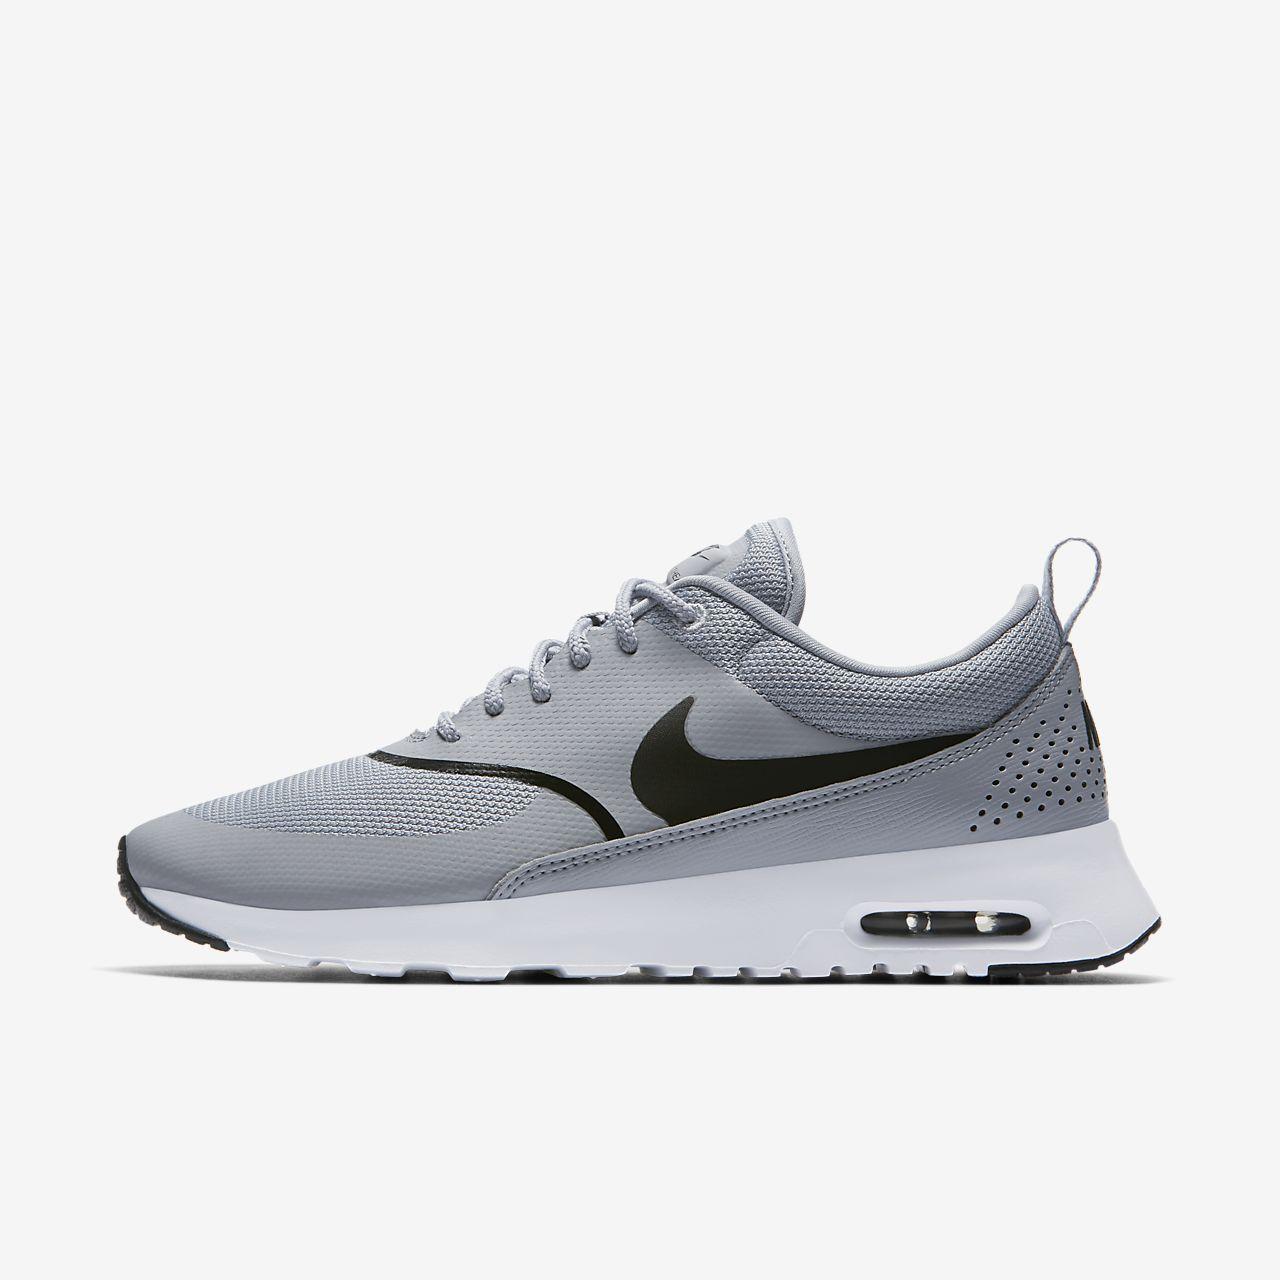 wholesale dealer 63214 b570b Chaussure Nike Air Max Thea pour Femme